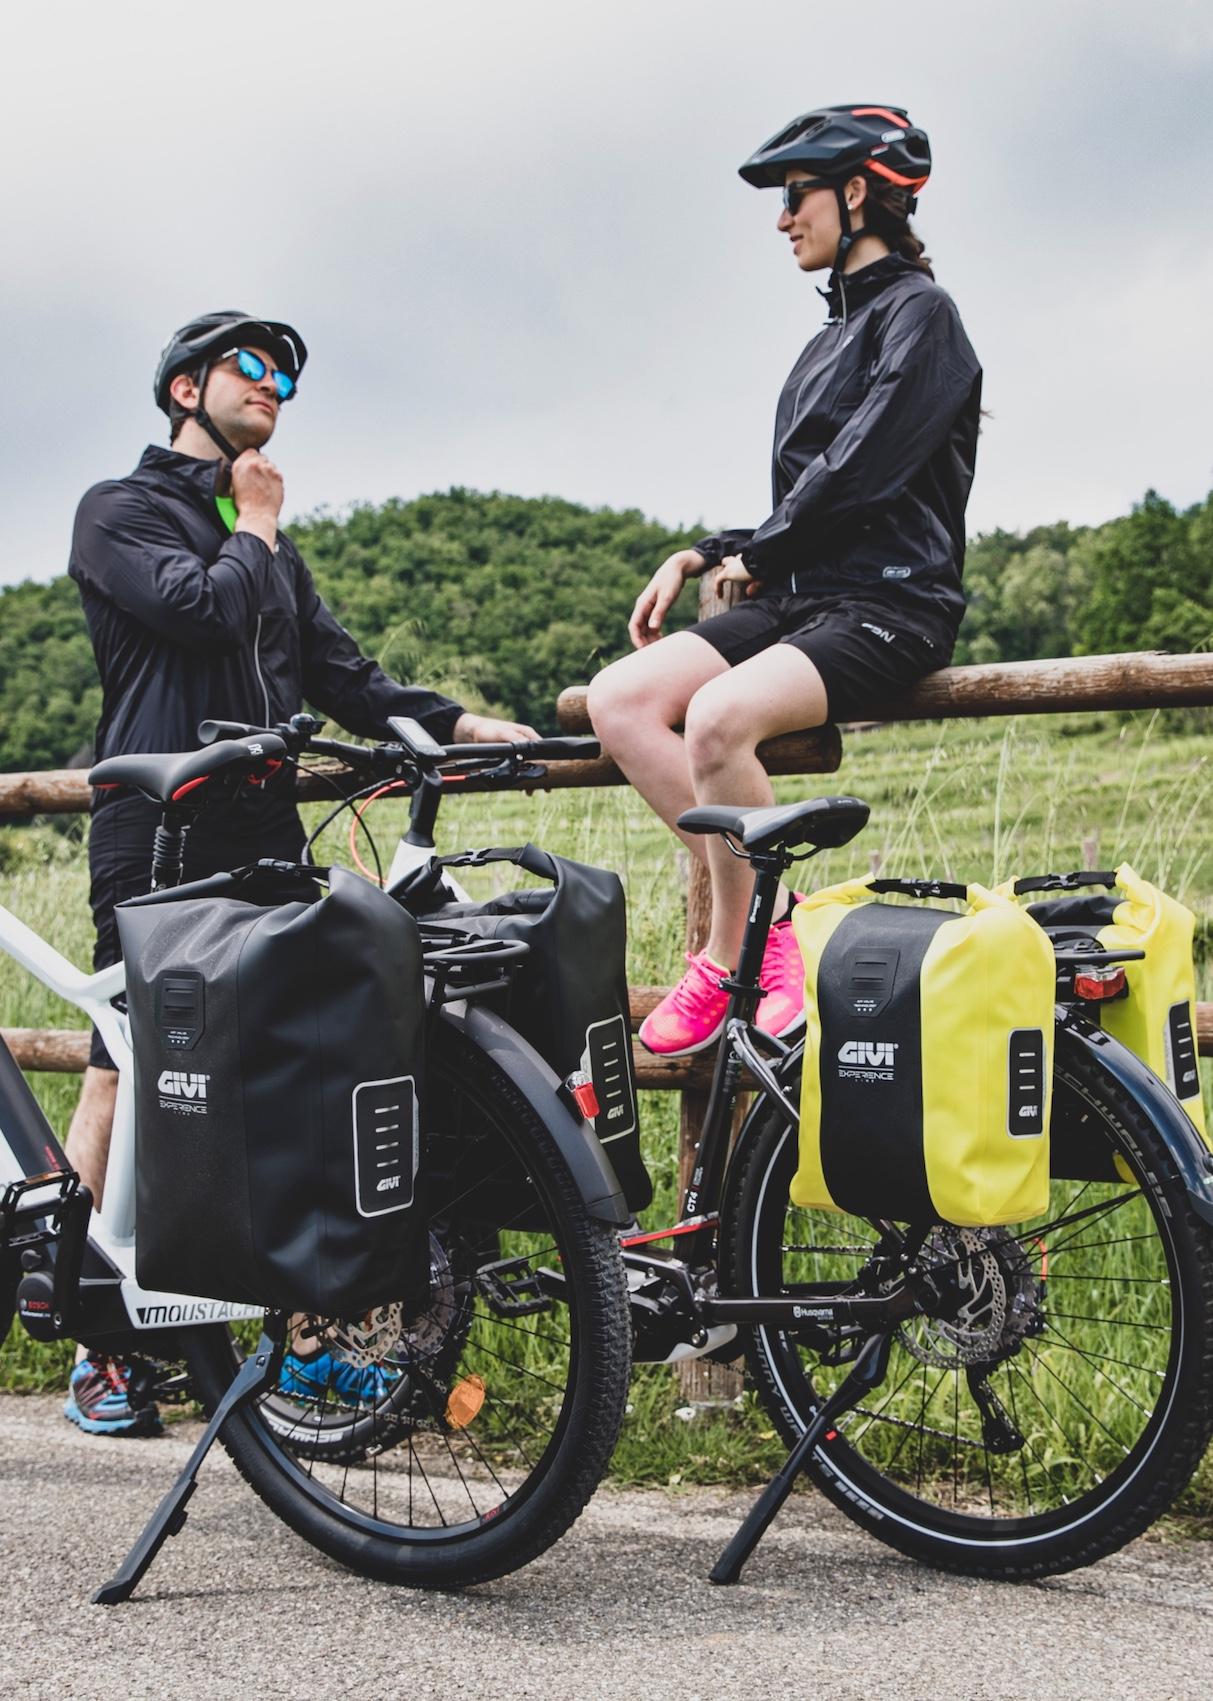 GIVI_bike_apertura